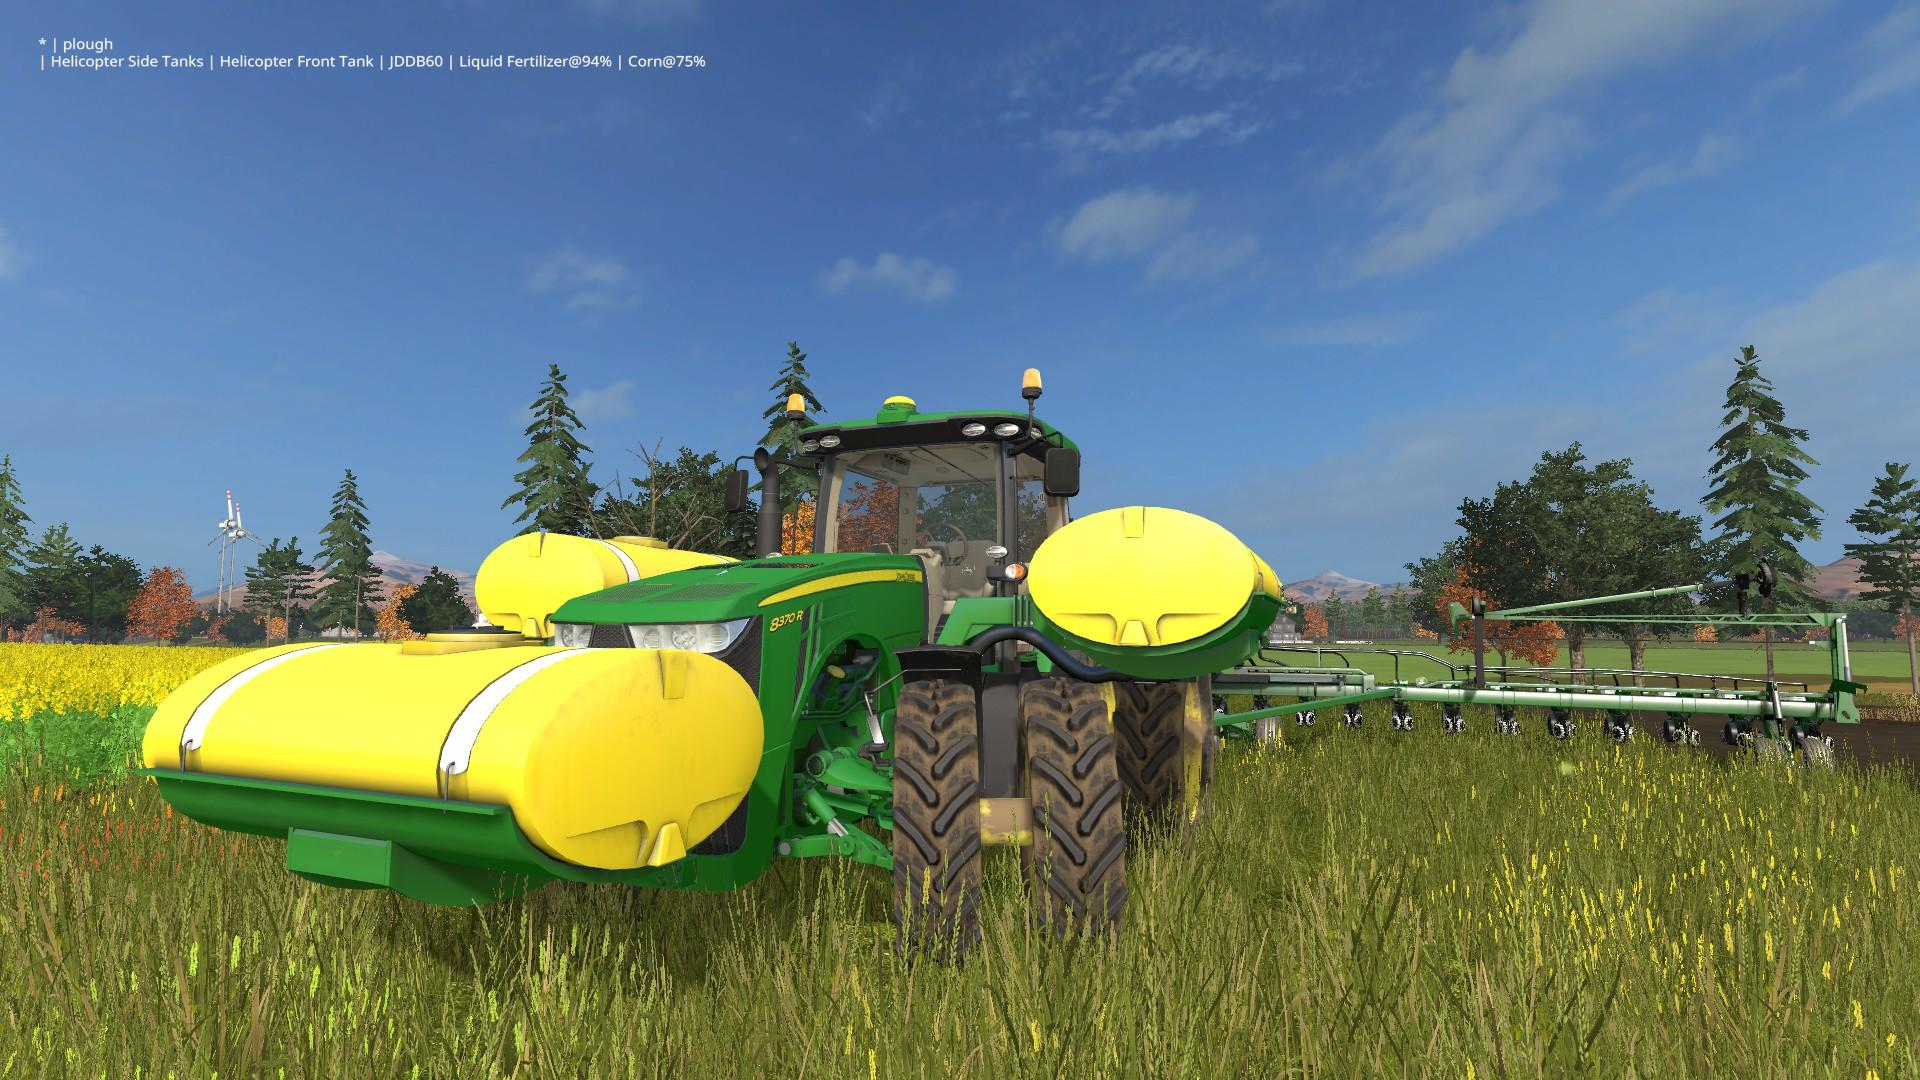 Helicopter Support Tanks V1 0 For Fs 2017 Farming